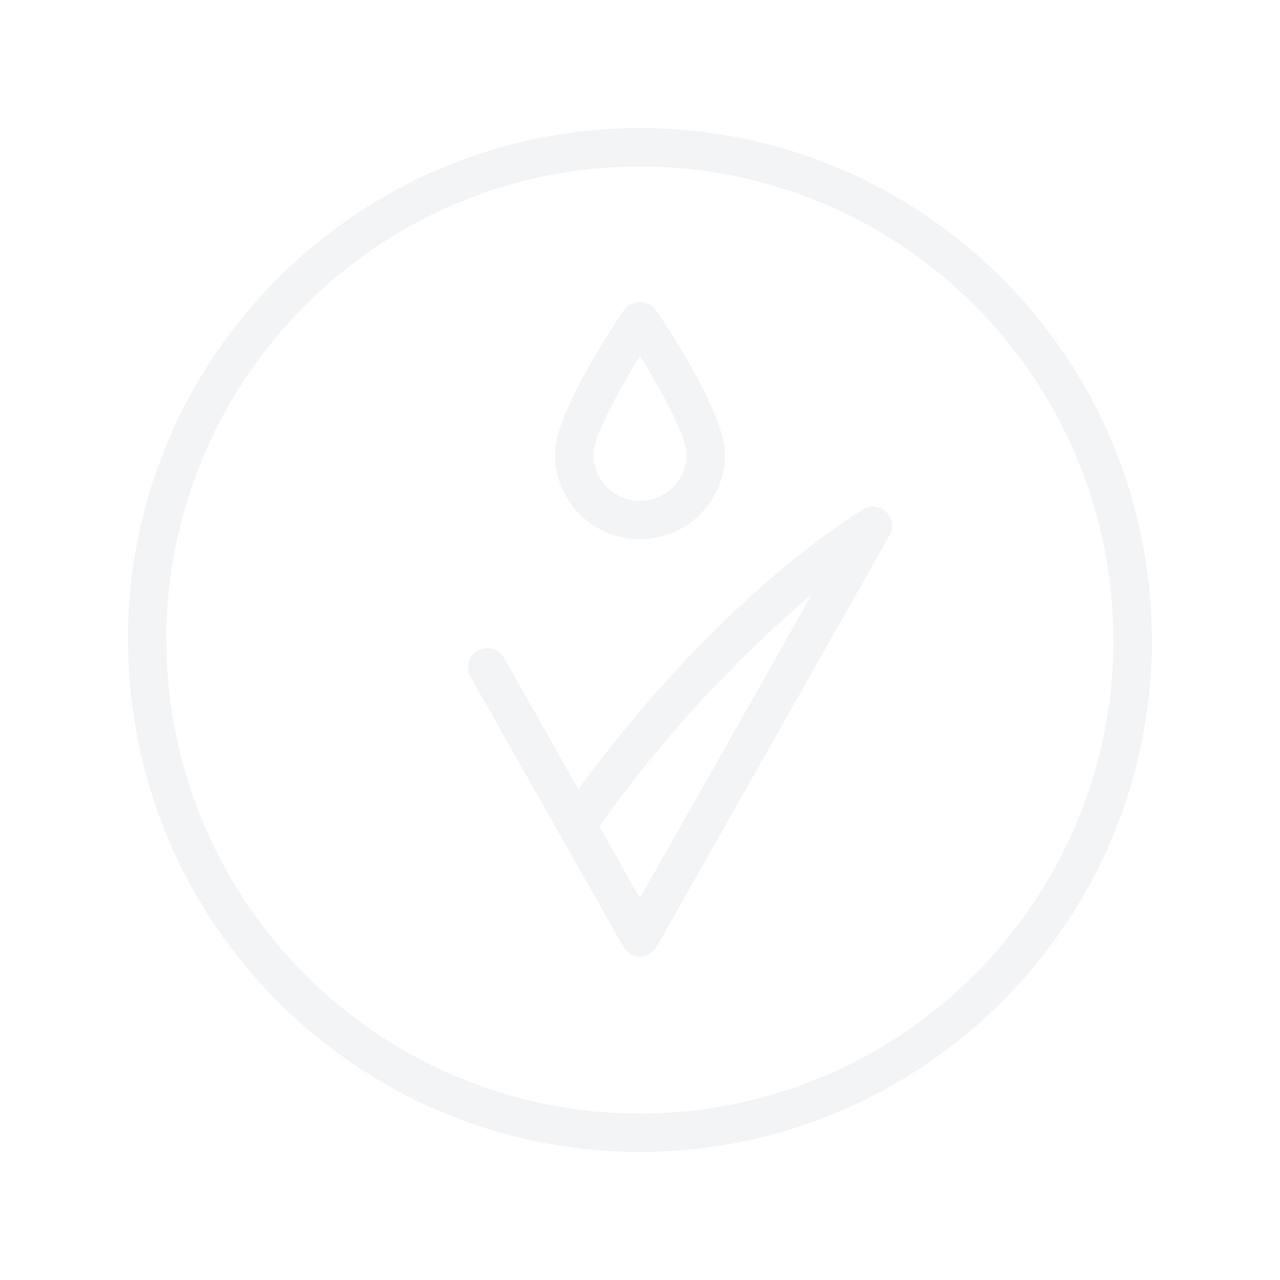 PHYTO Phytokeratine Extreme Shampoo 50ml